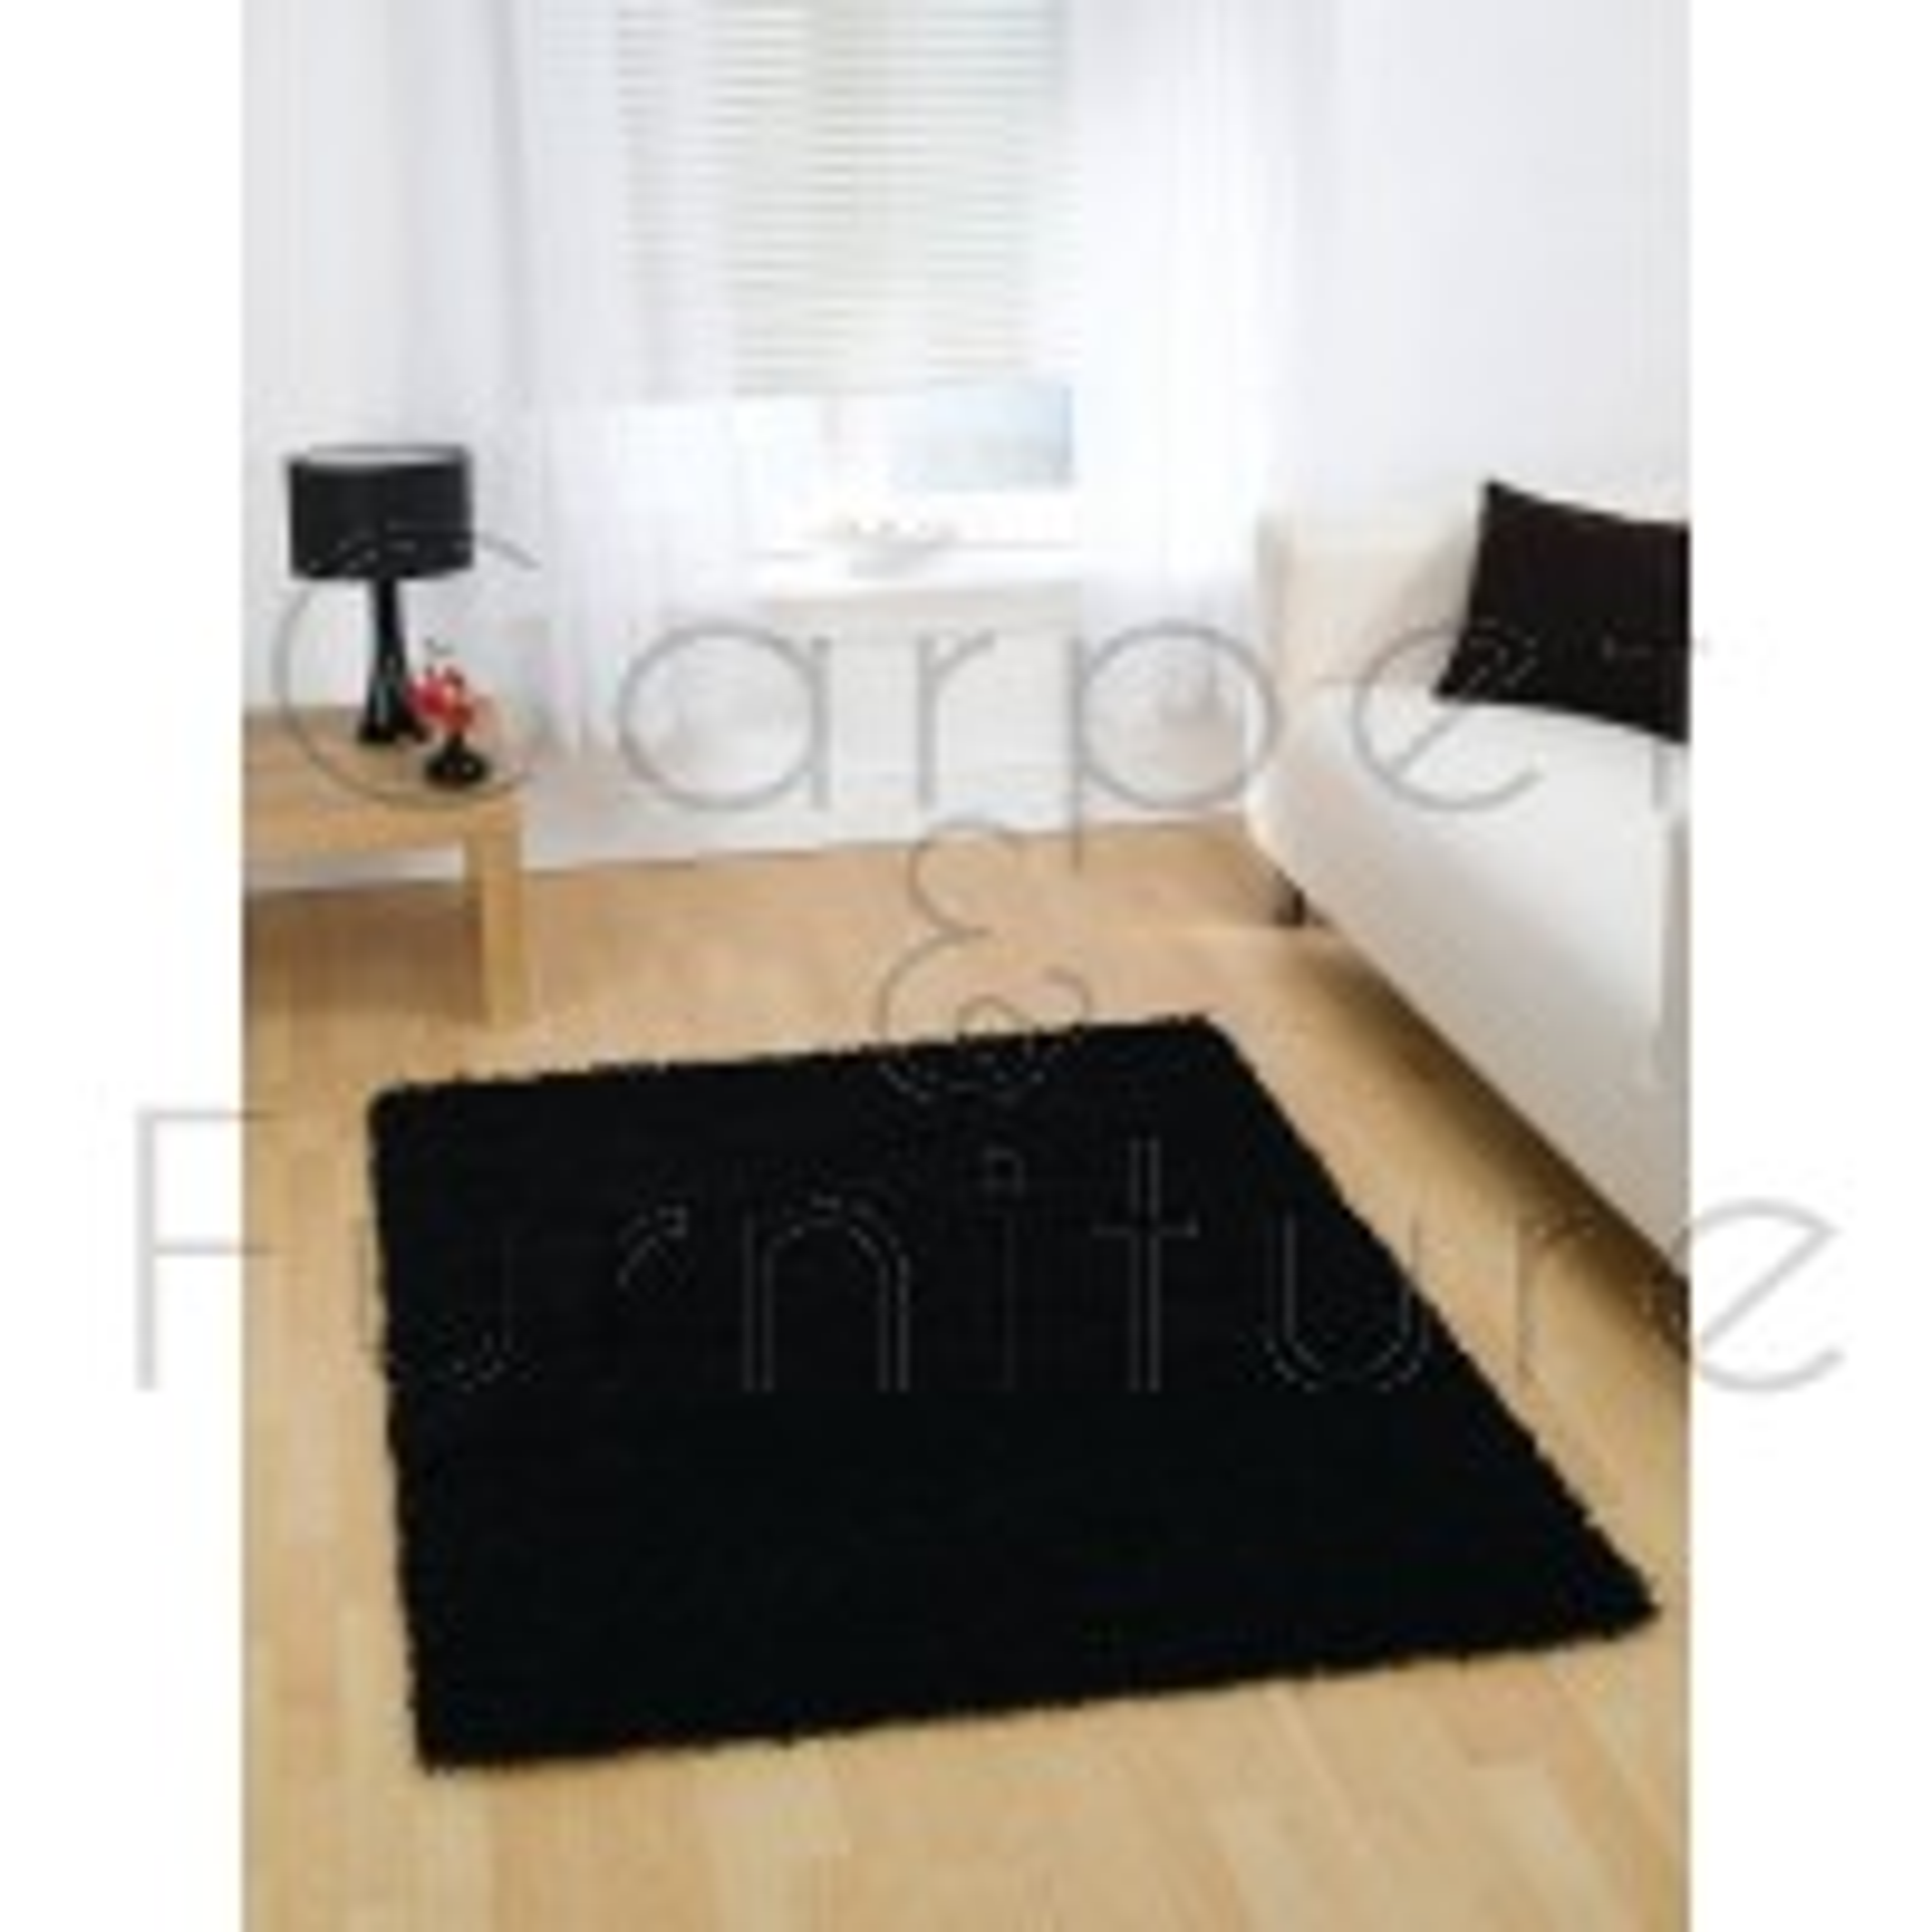 "Nordic Cariboo Shaggy Rug - Black - Size 120 x 170 cm (4' x 5'7"")"